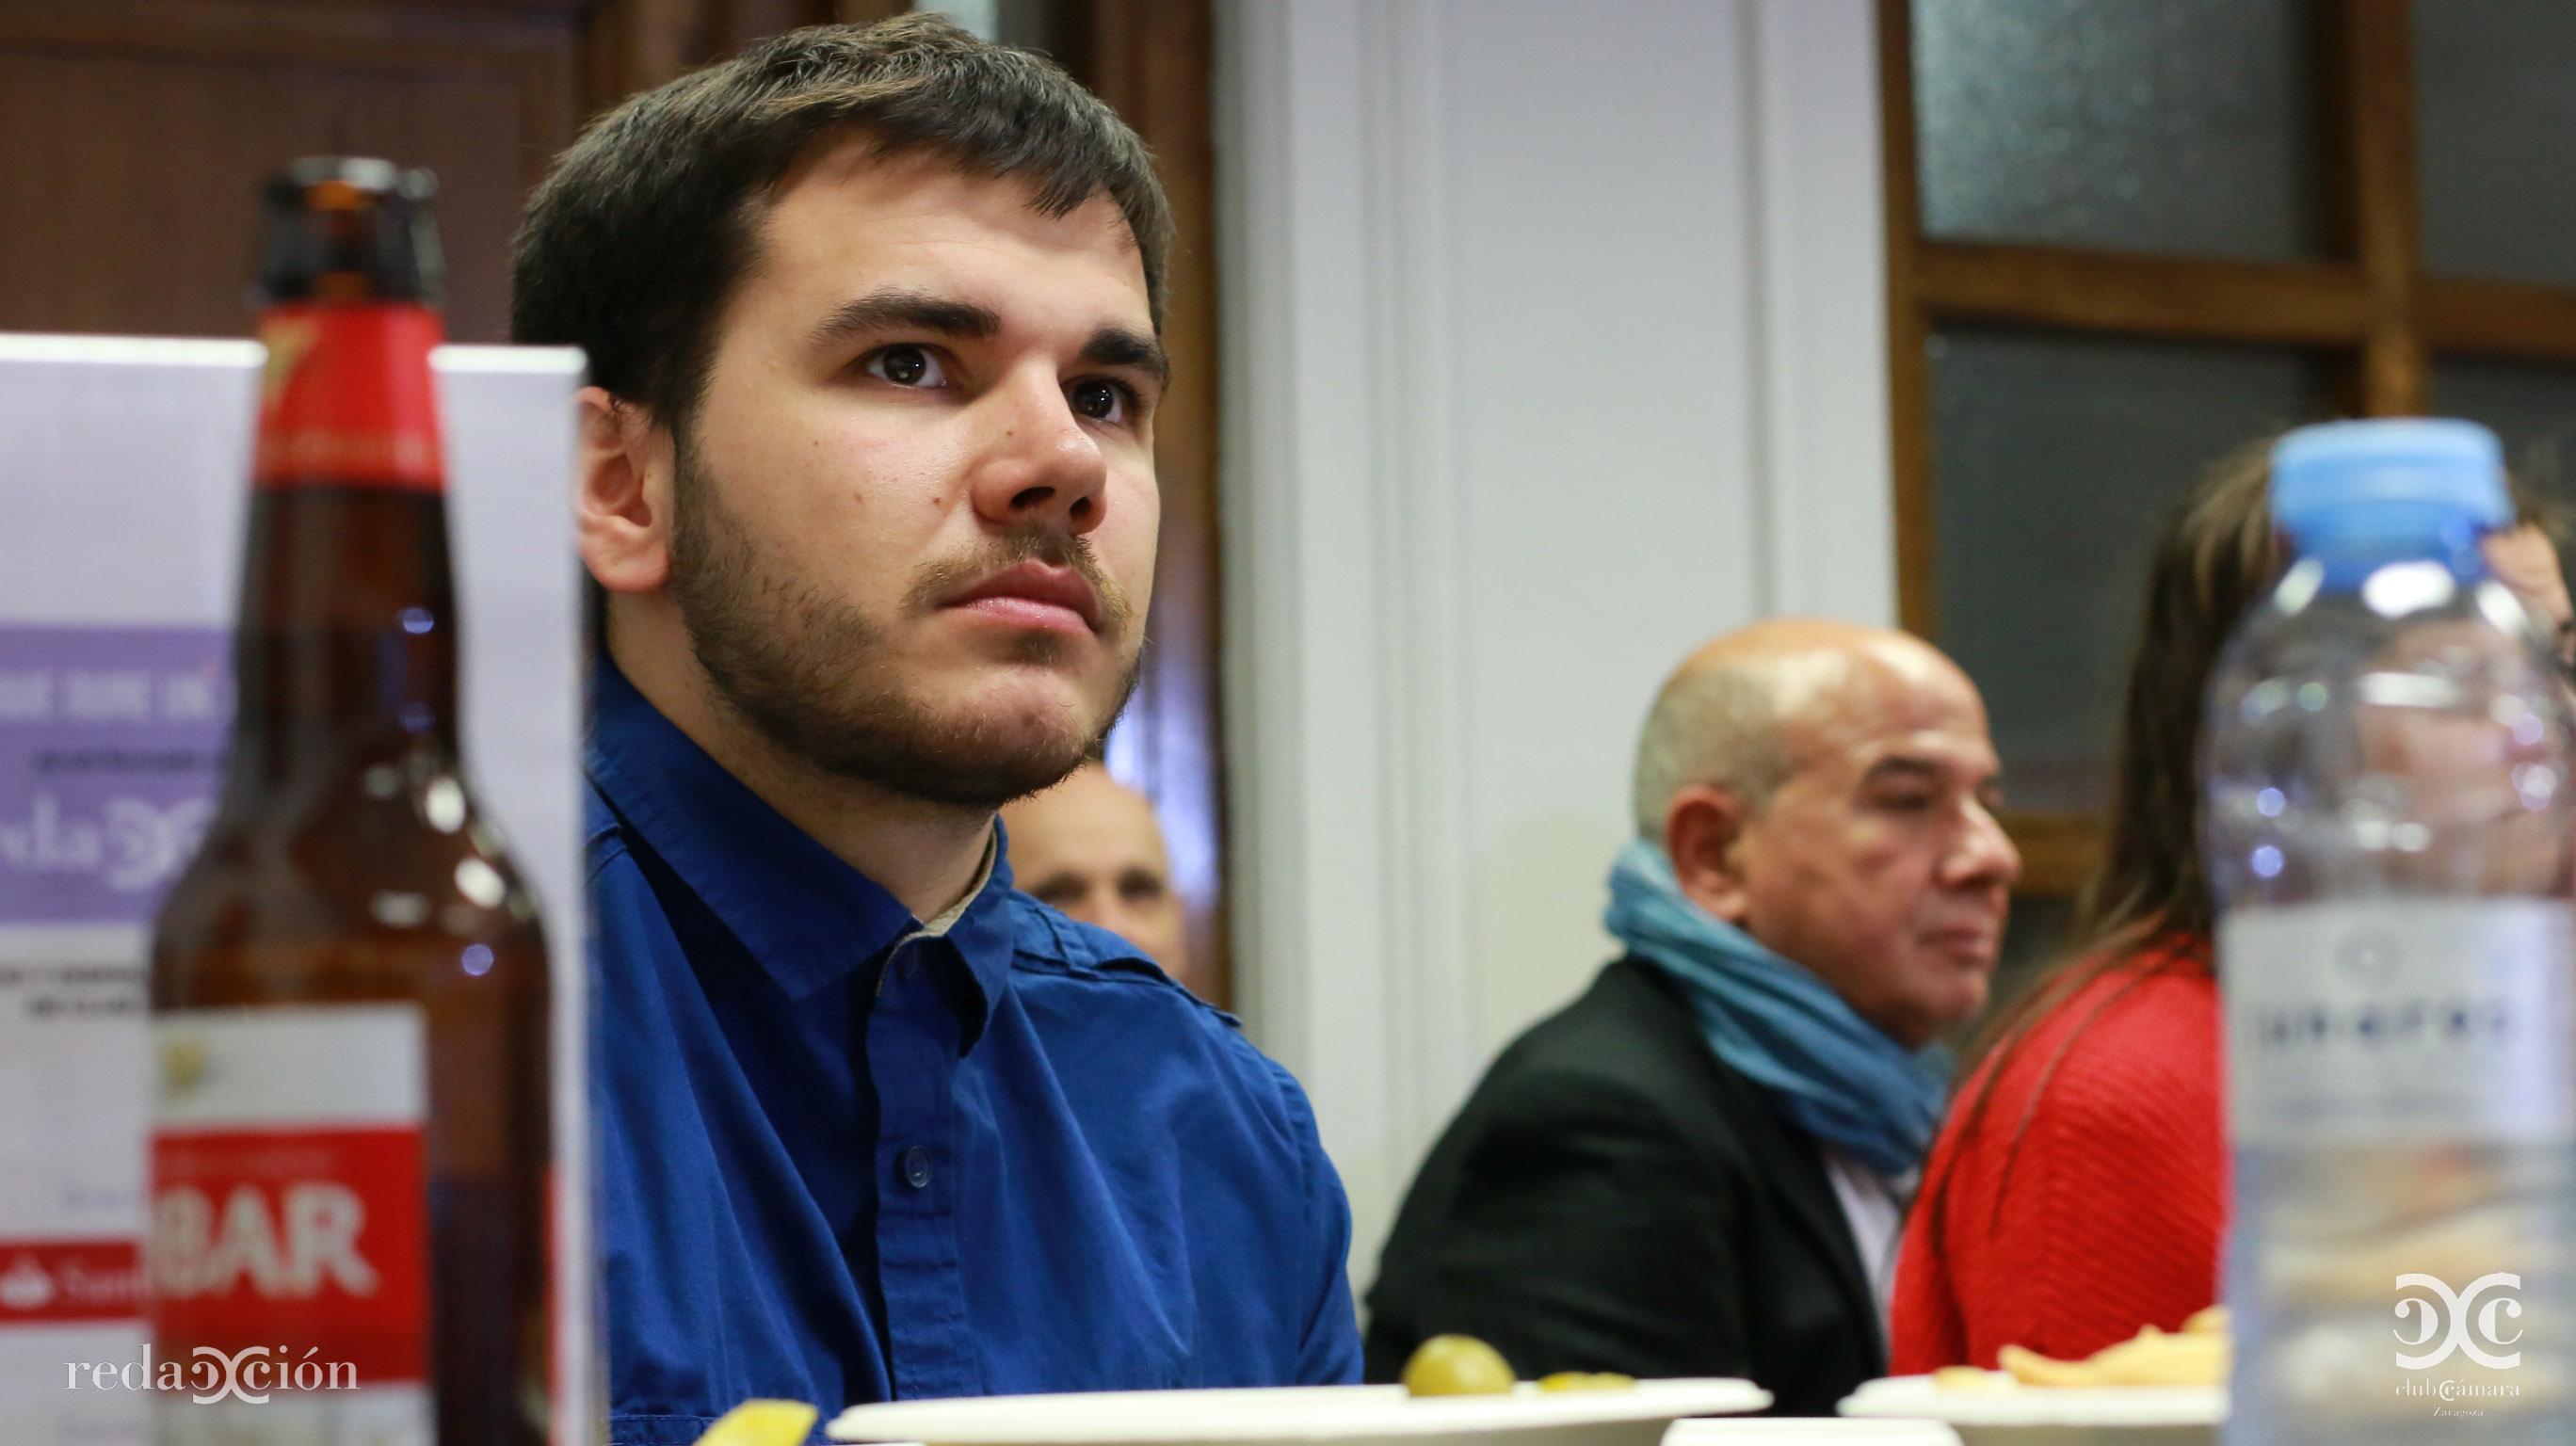 Alejandro Calderón Herizont